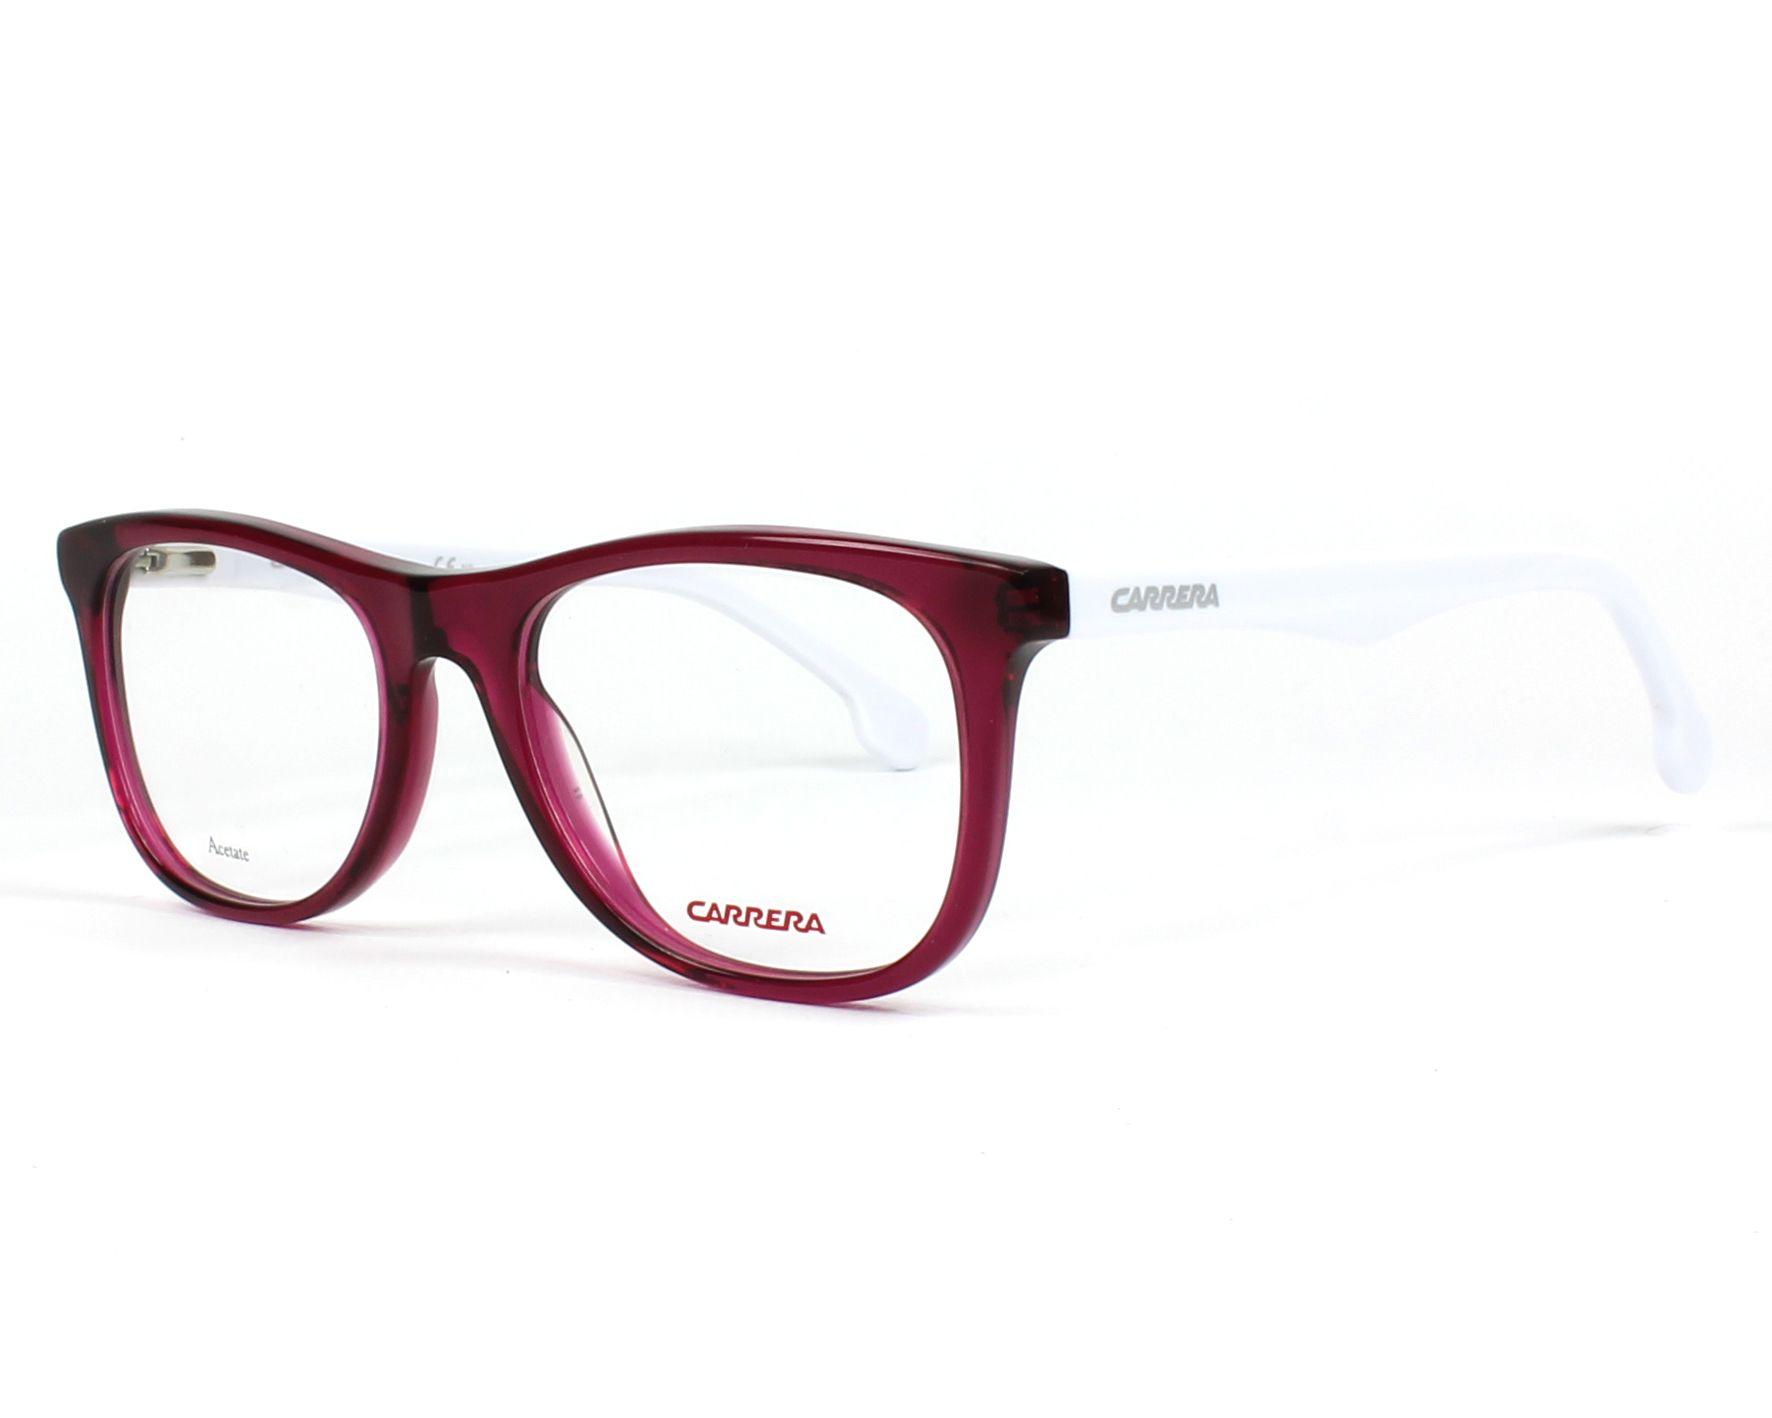 Carrera Eyewear Kinderbrillen Brille » CARRERINO 63«, rot, W6Q - rot